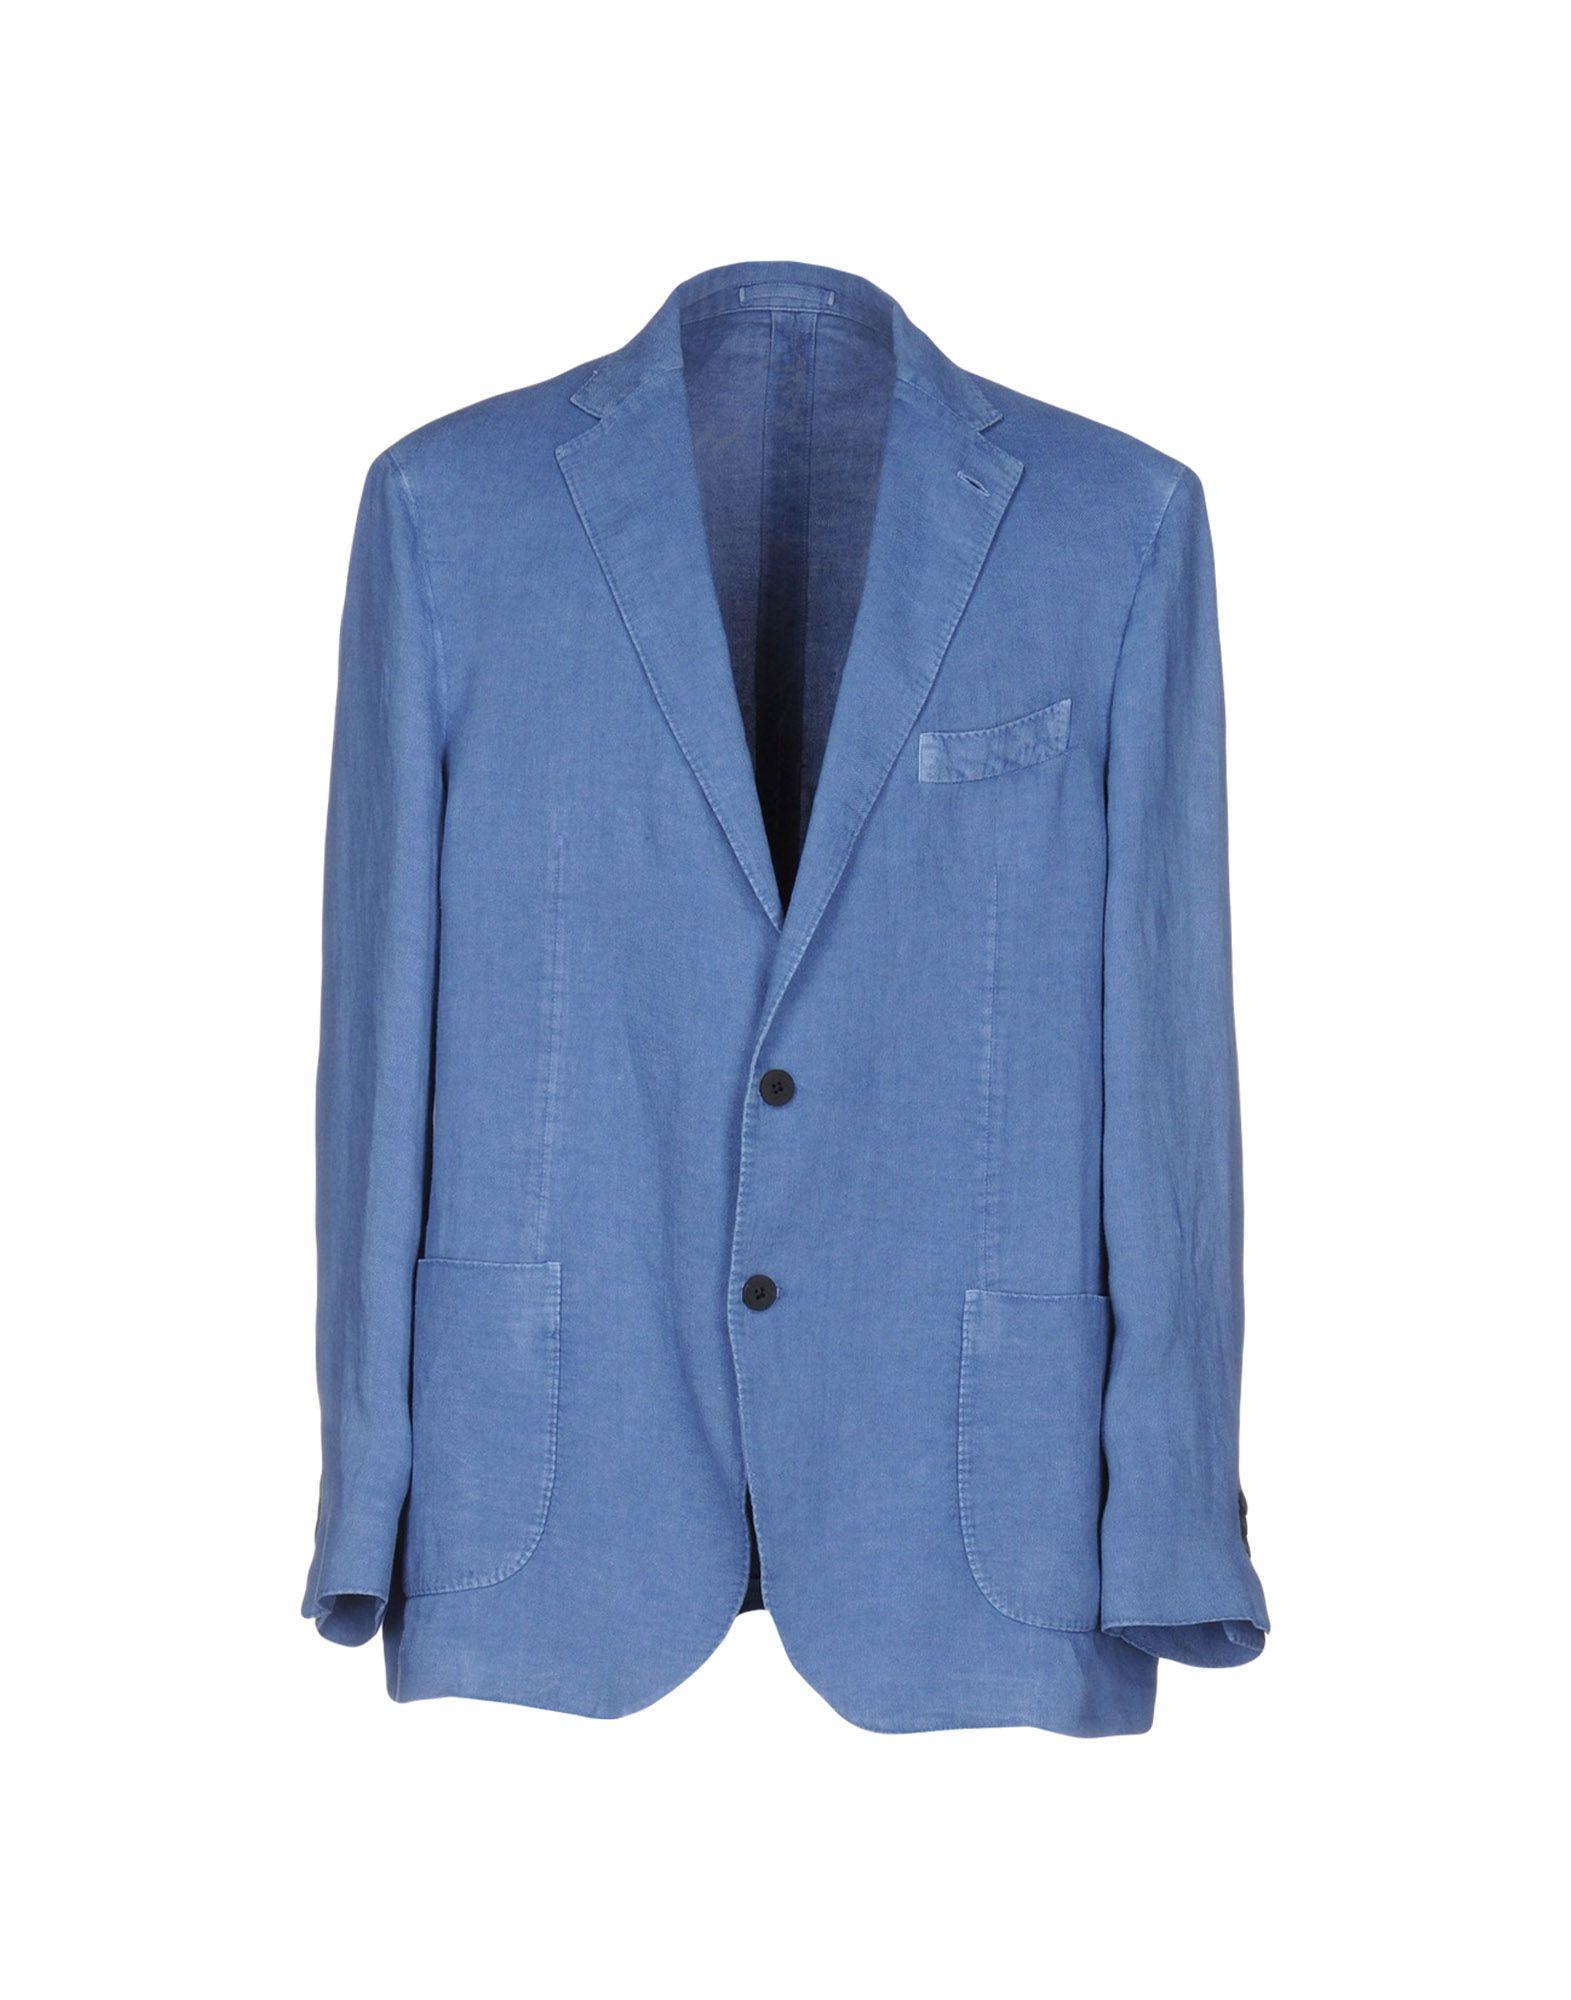 LARDINI Herren Jackett Farbe Blaugrau Größe 6 jetztbilligerkaufen